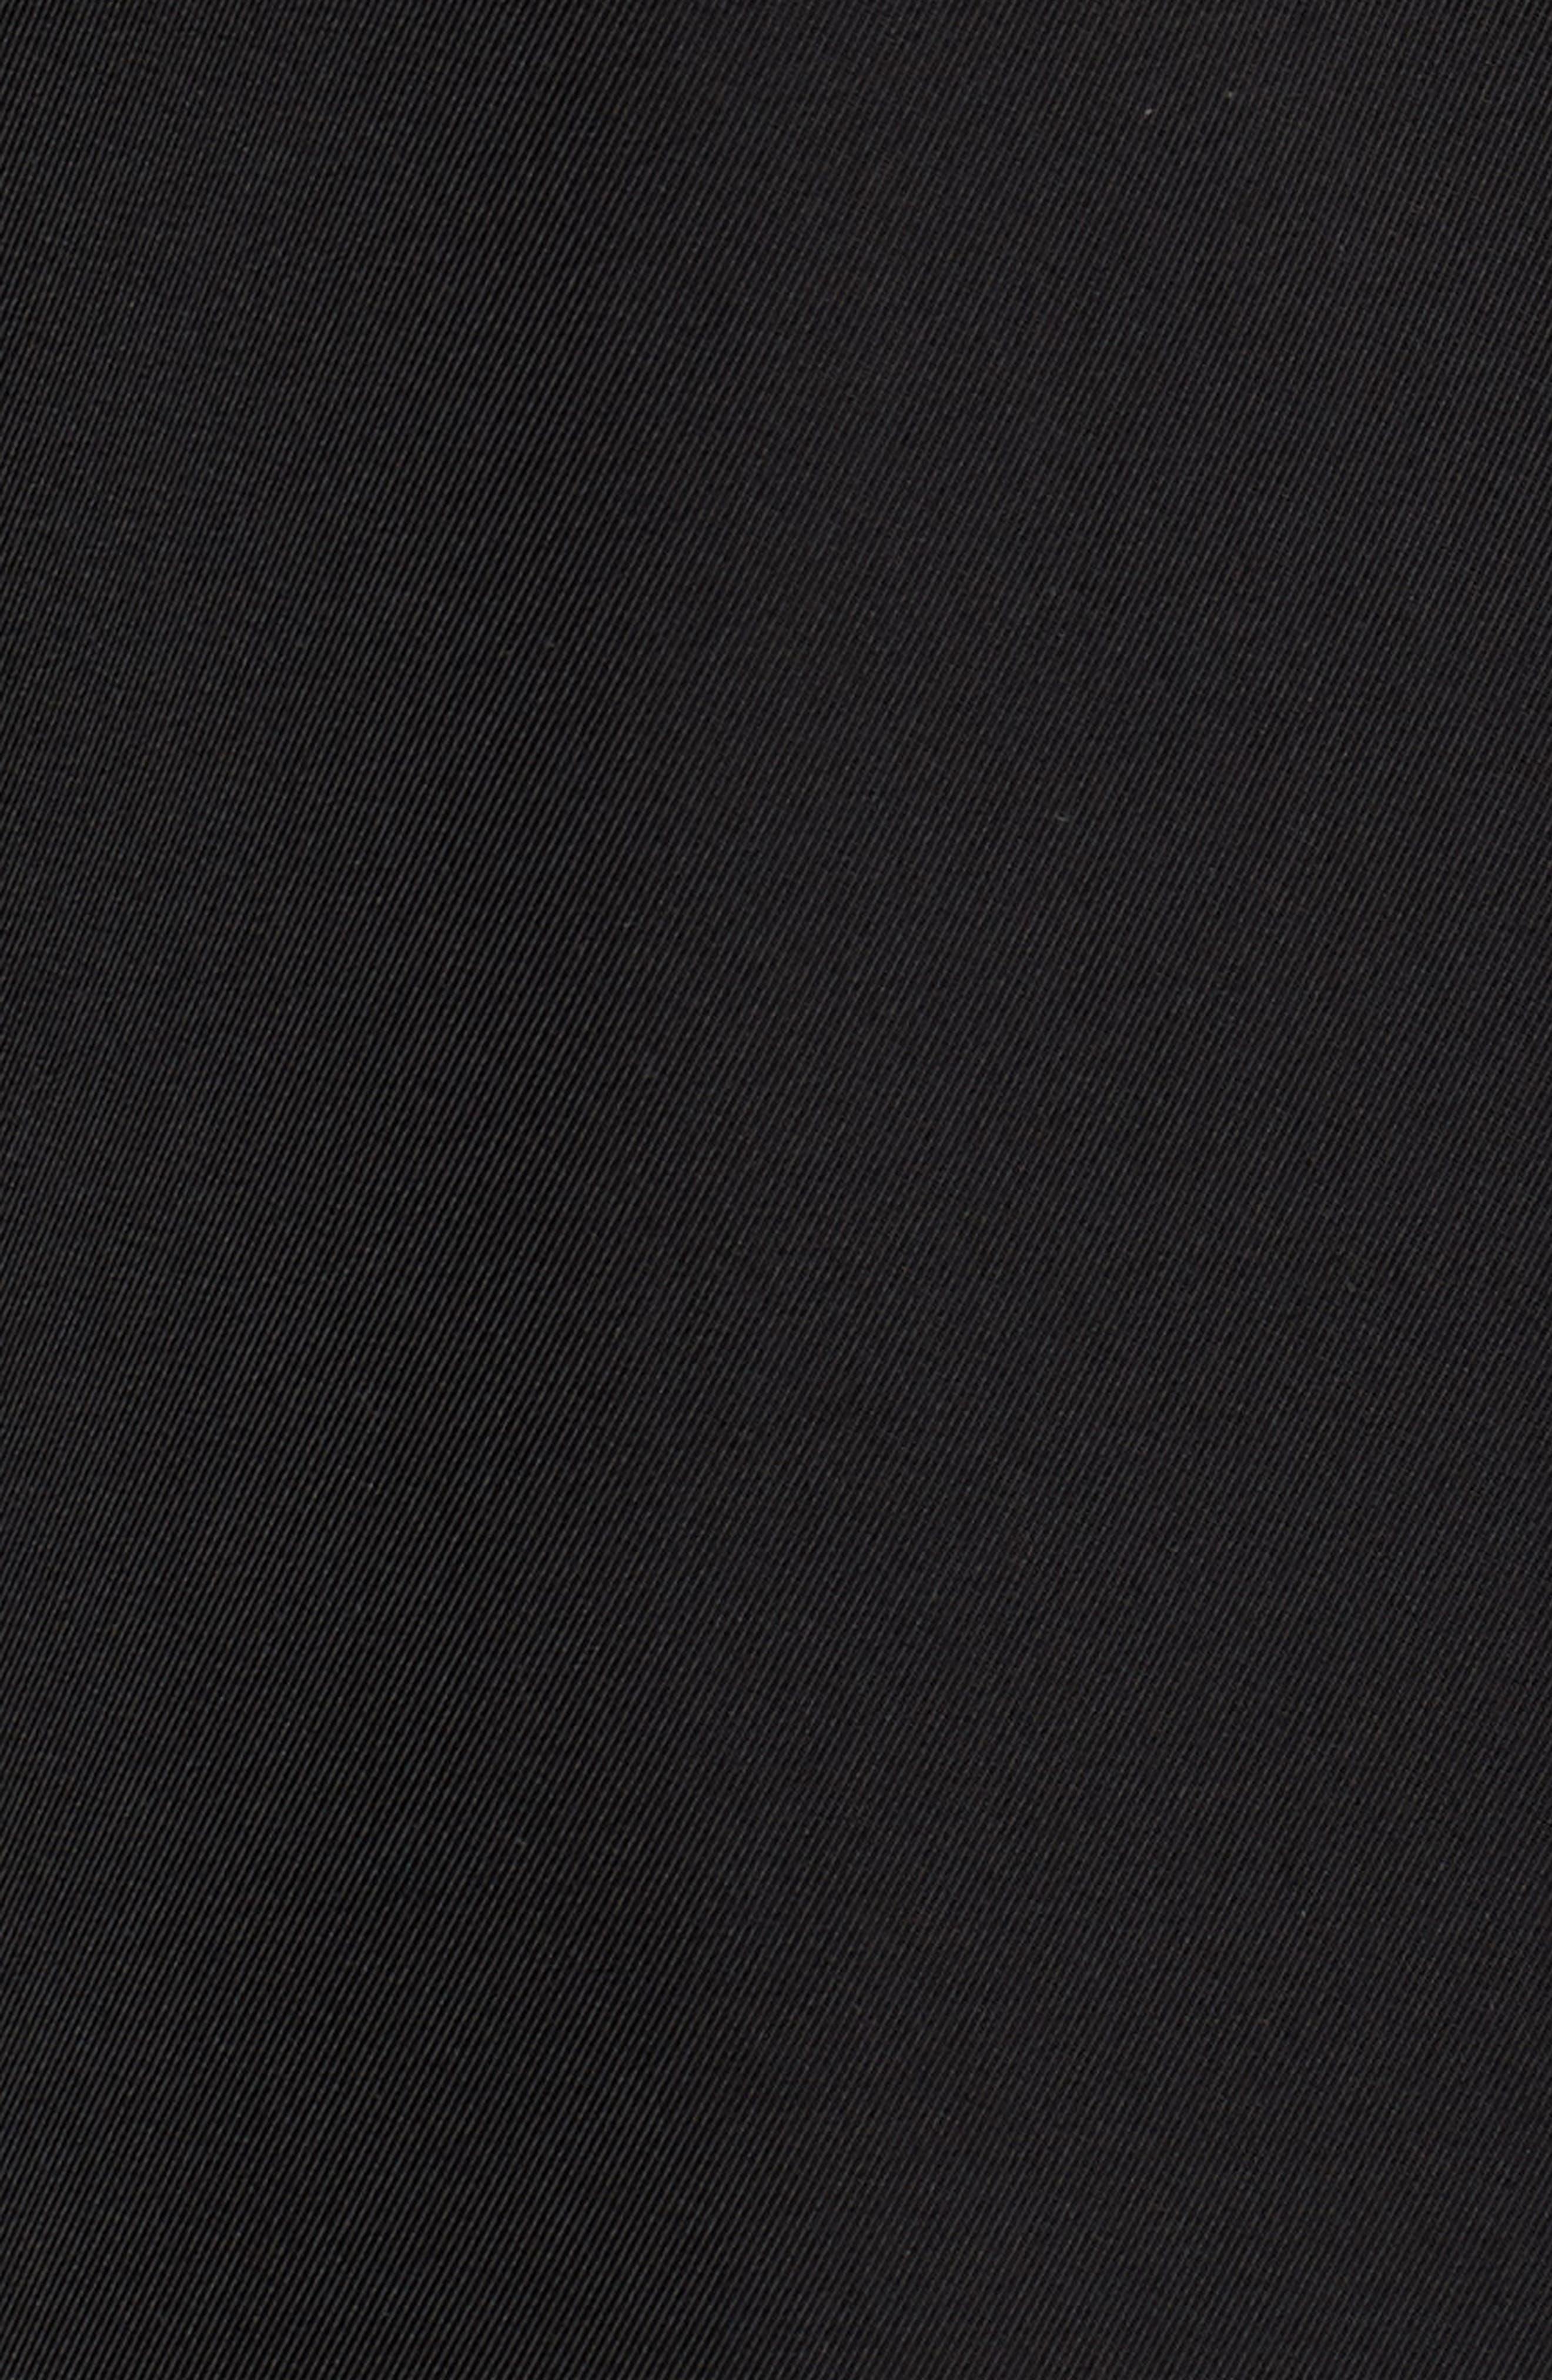 Hardy Getaway Raincoat,                             Alternate thumbnail 6, color,                             BLACK